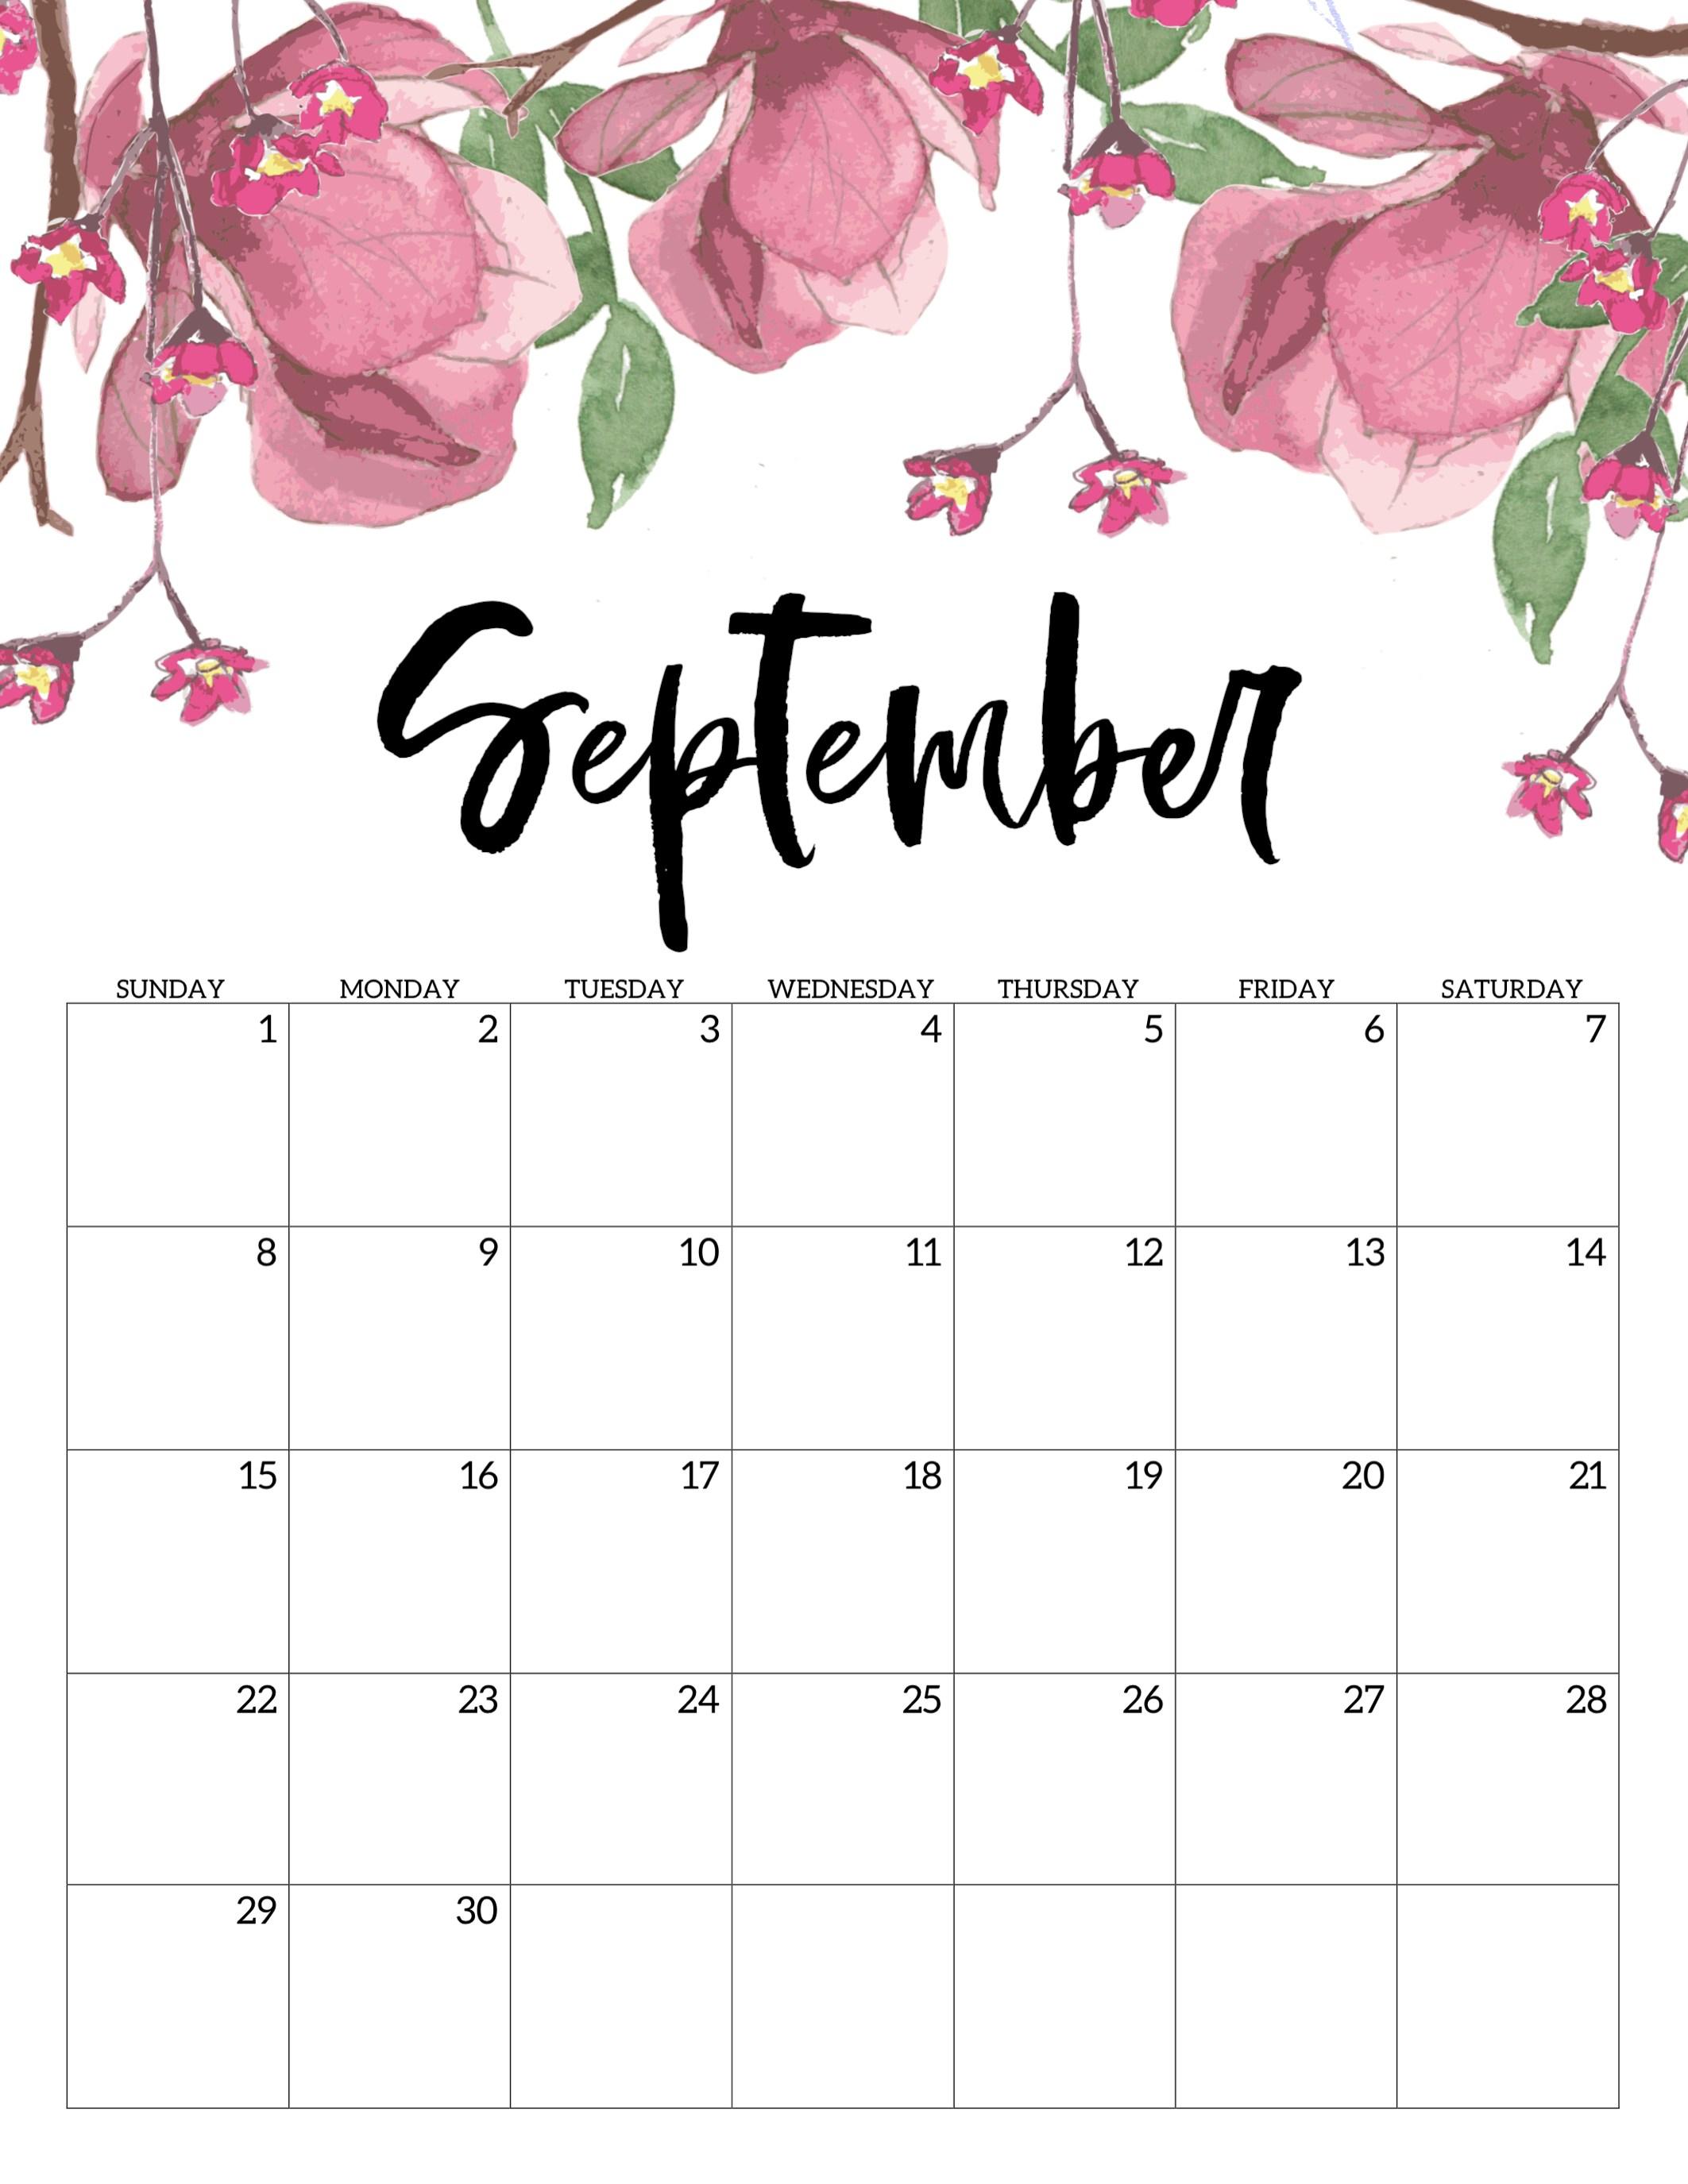 Free Printable Calandars 2019 Calendar With Holidays